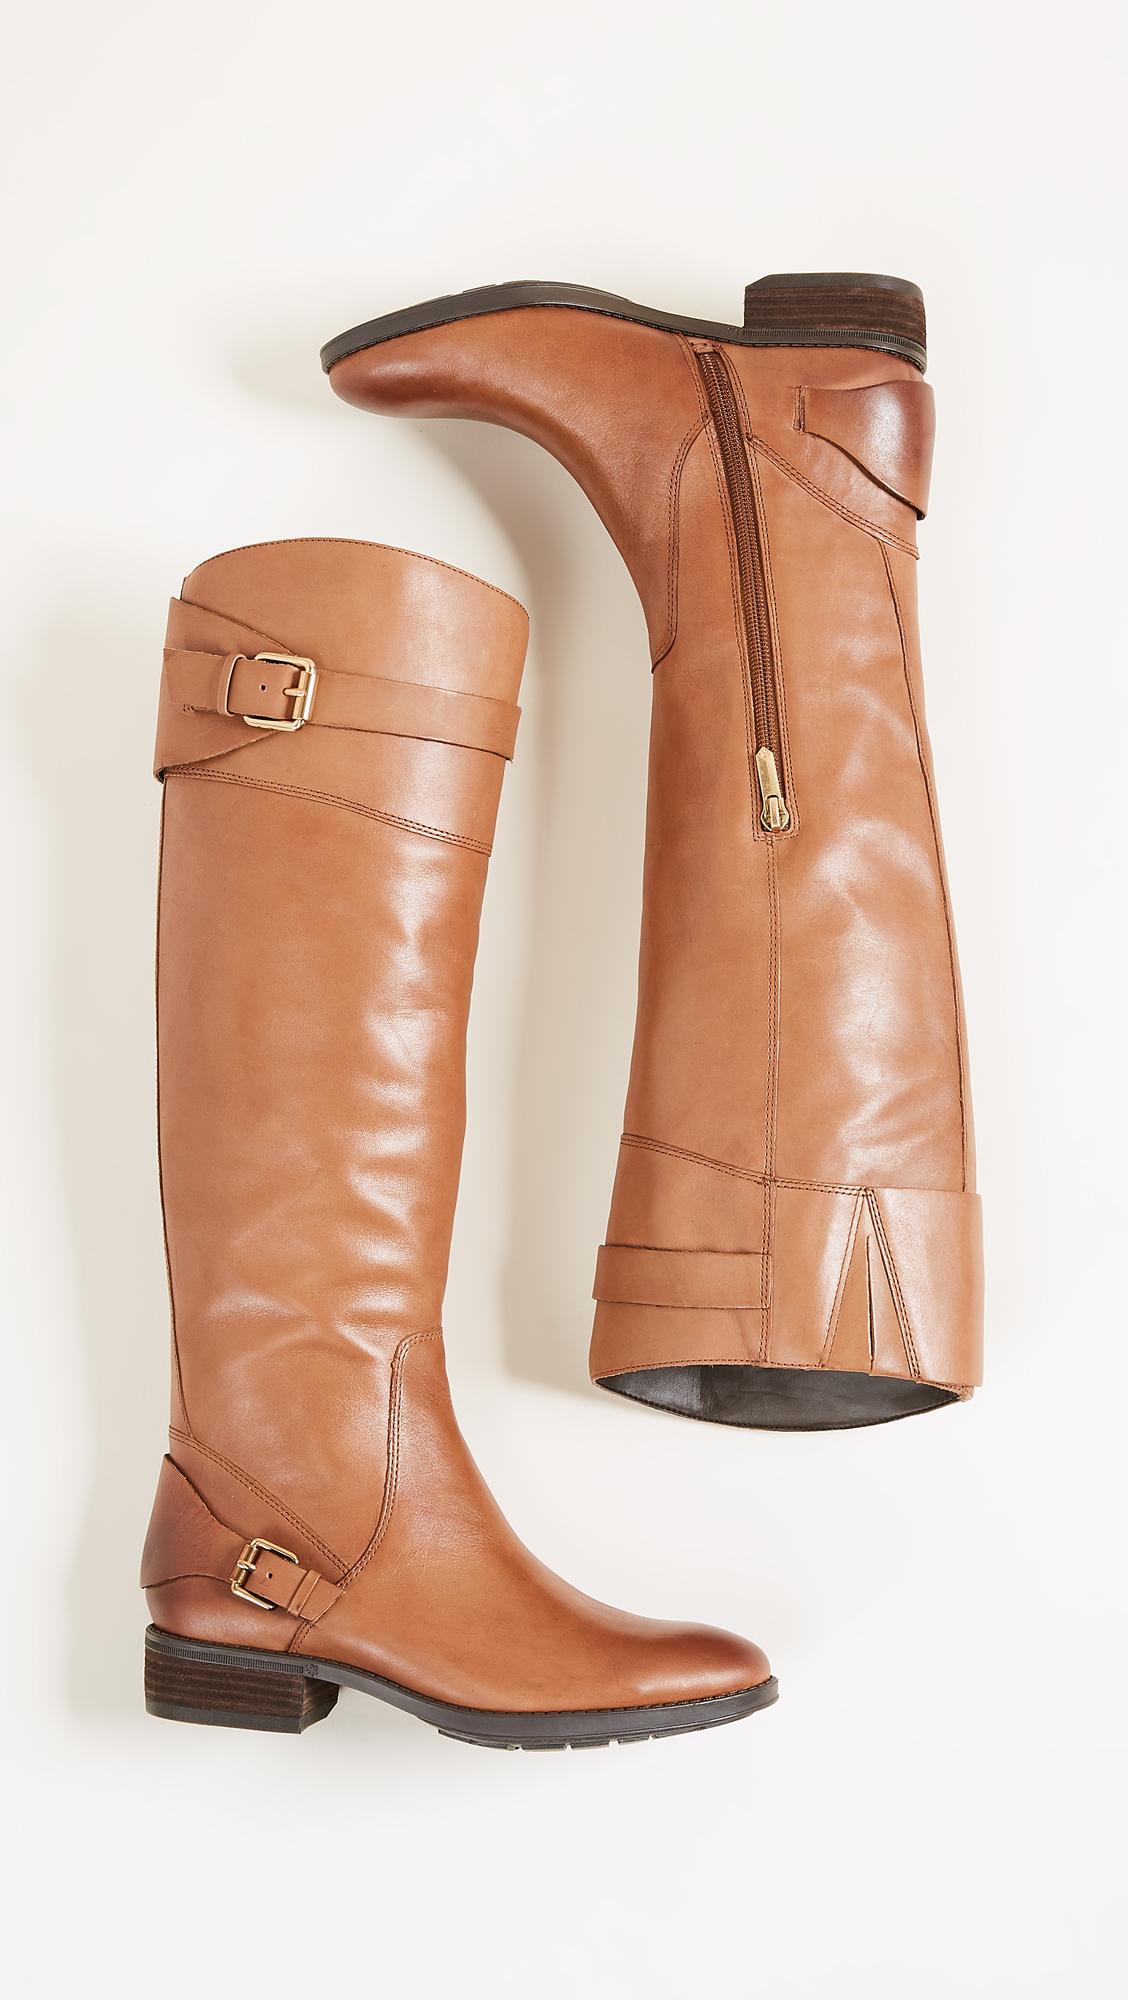 abcc505a8162f Sam Edelman Portman Riding Boots